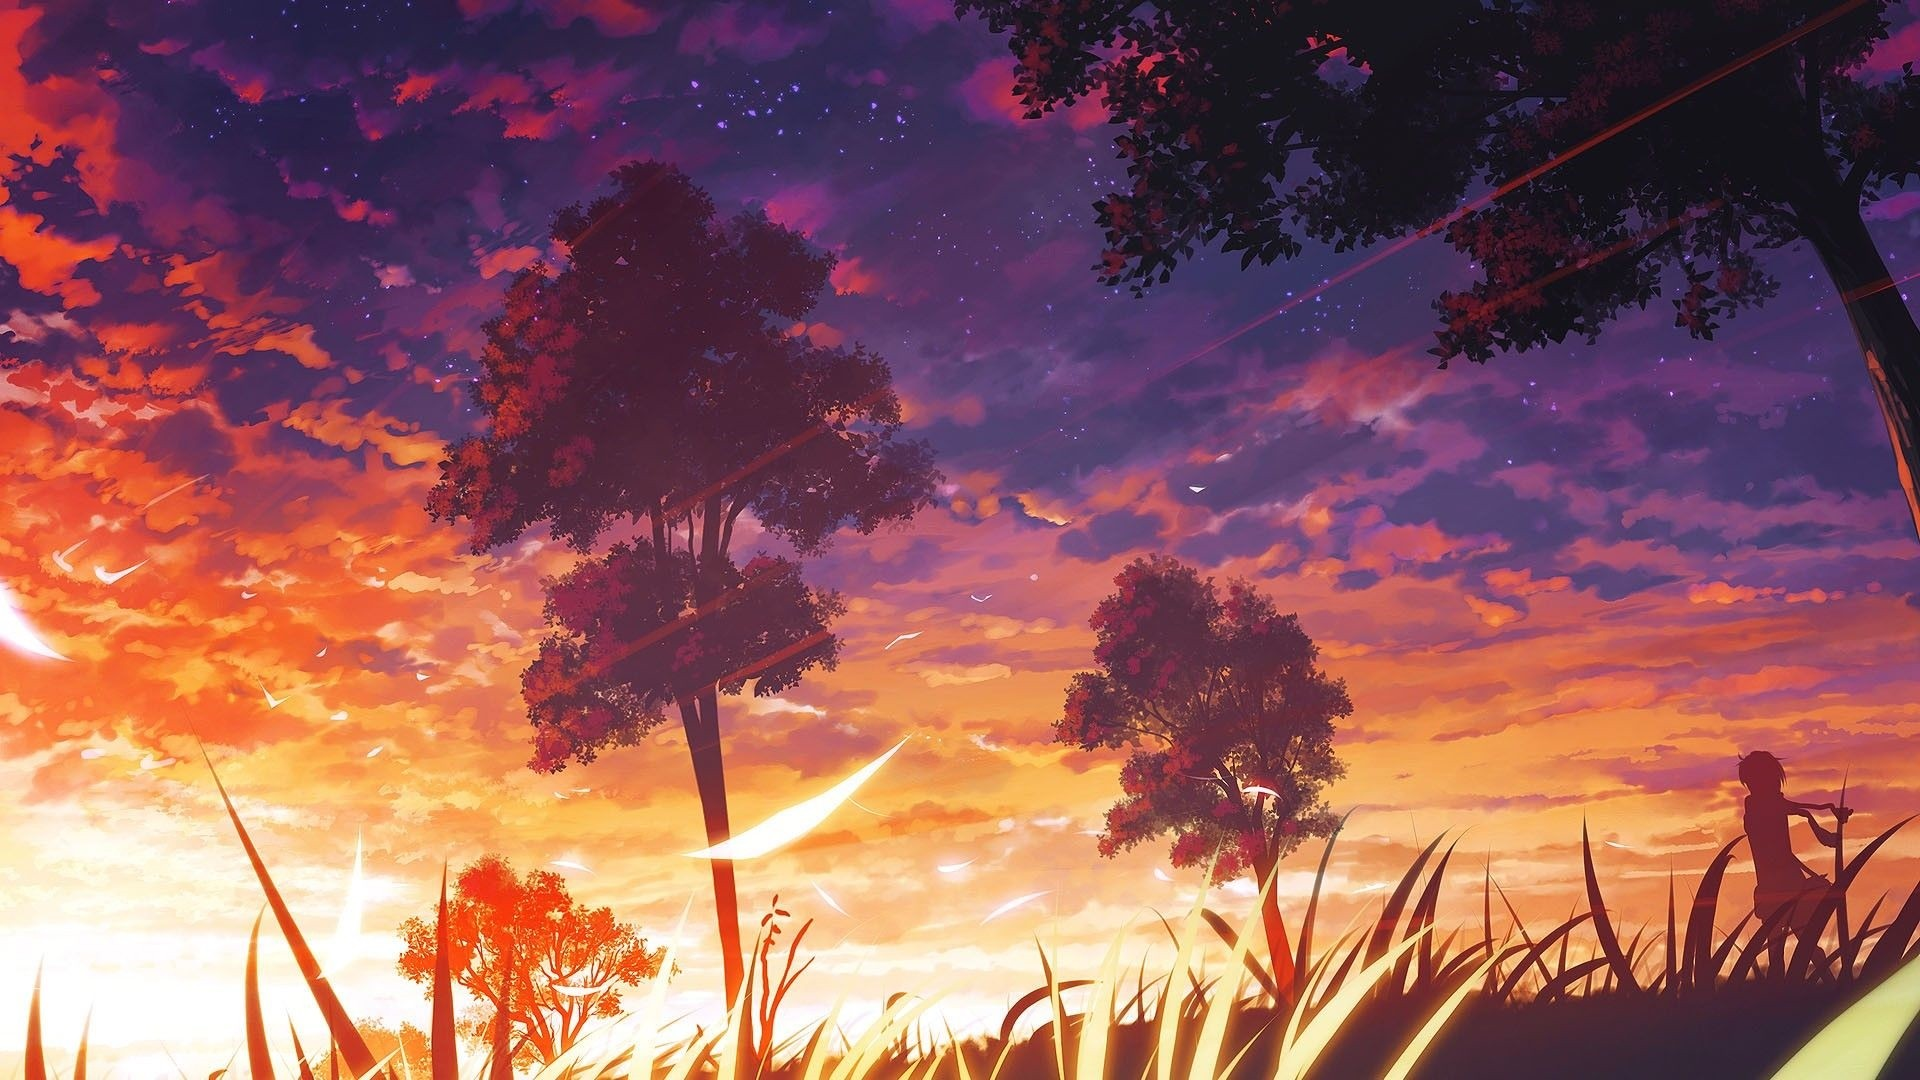 Anime Scenery Wallpaper Picture hd